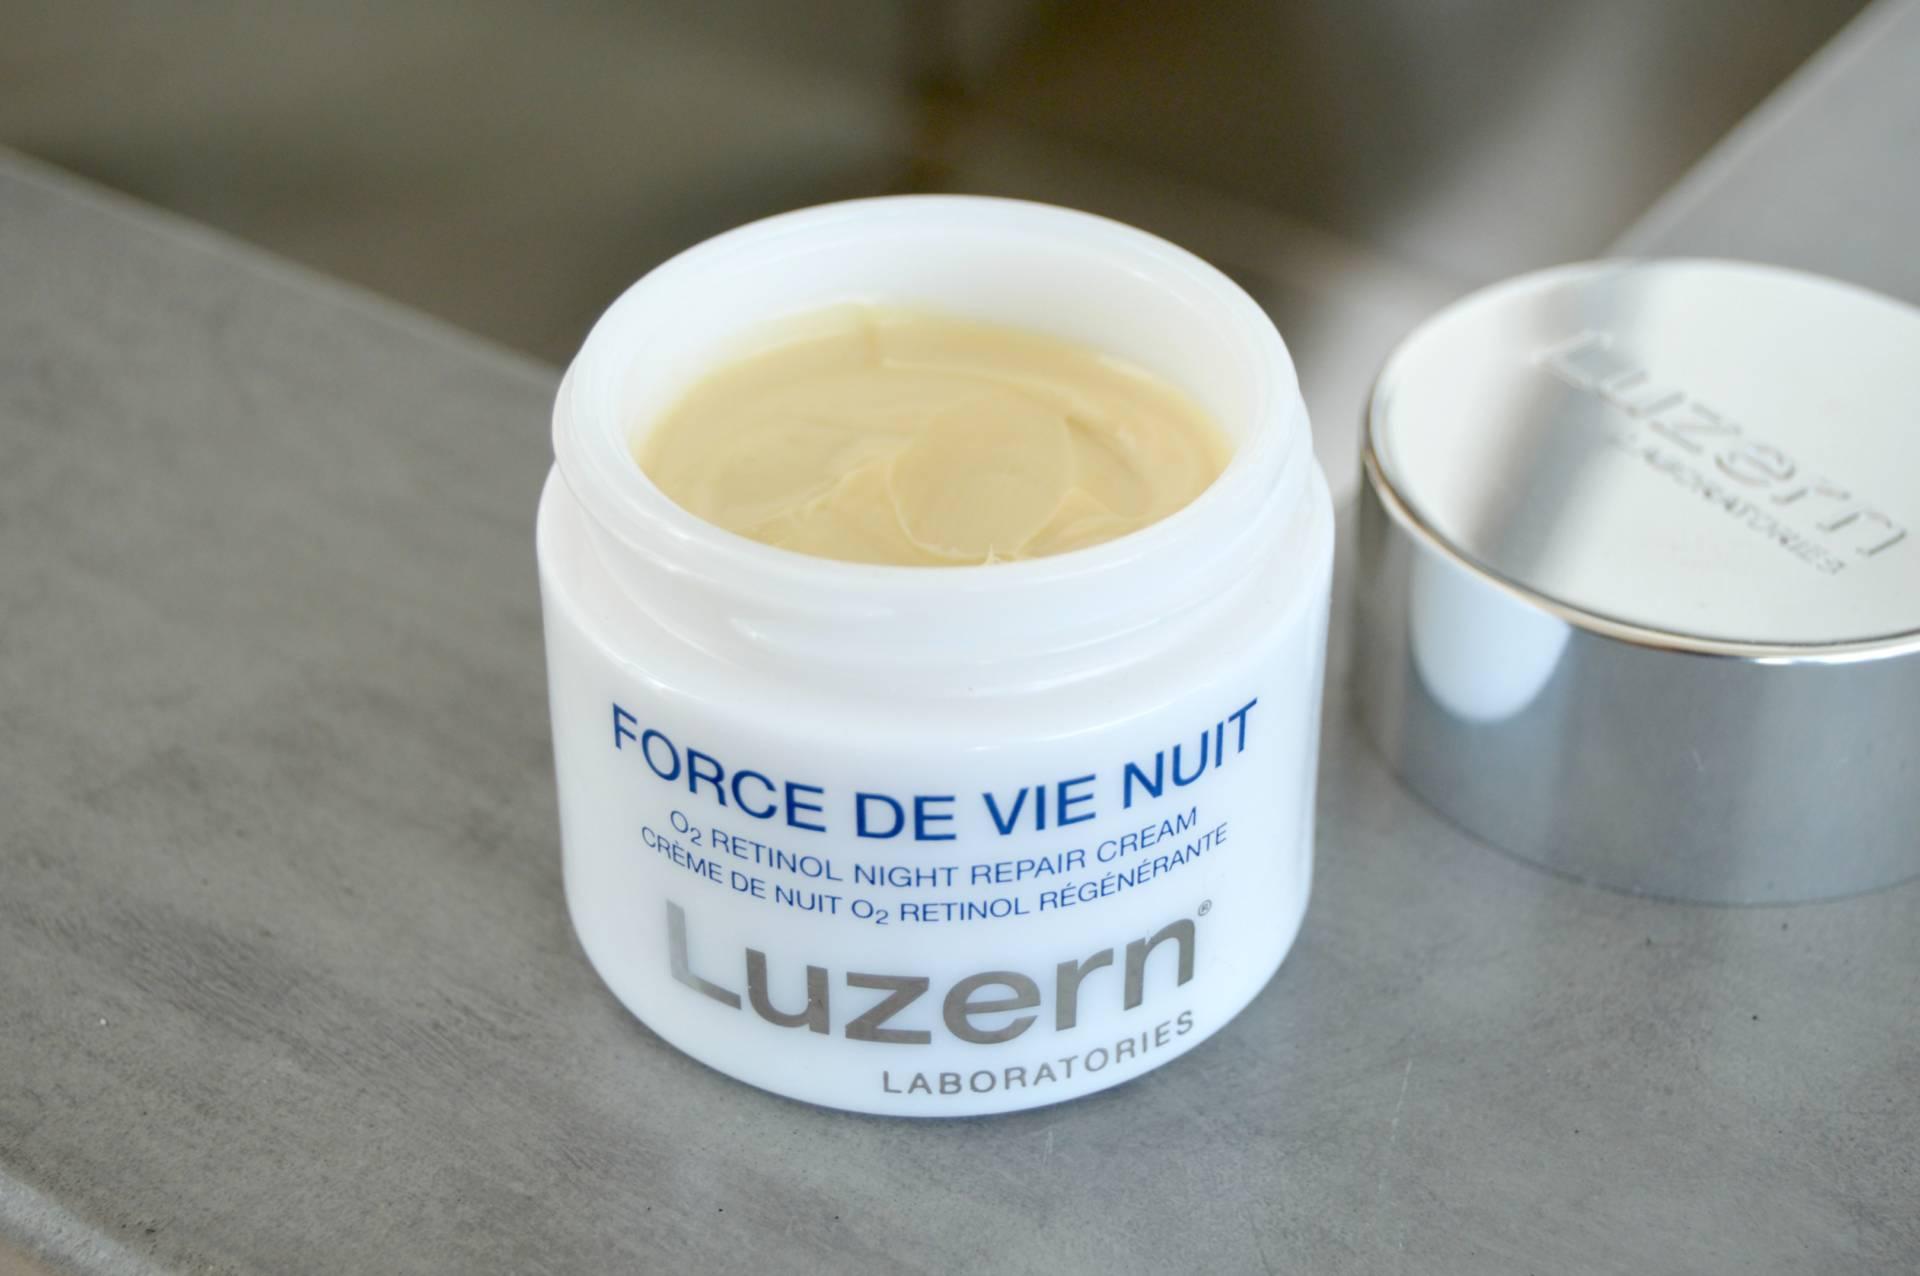 luzern-labs-inhautepursuit-force-de-vie-nuit-retinol-night-cream-review